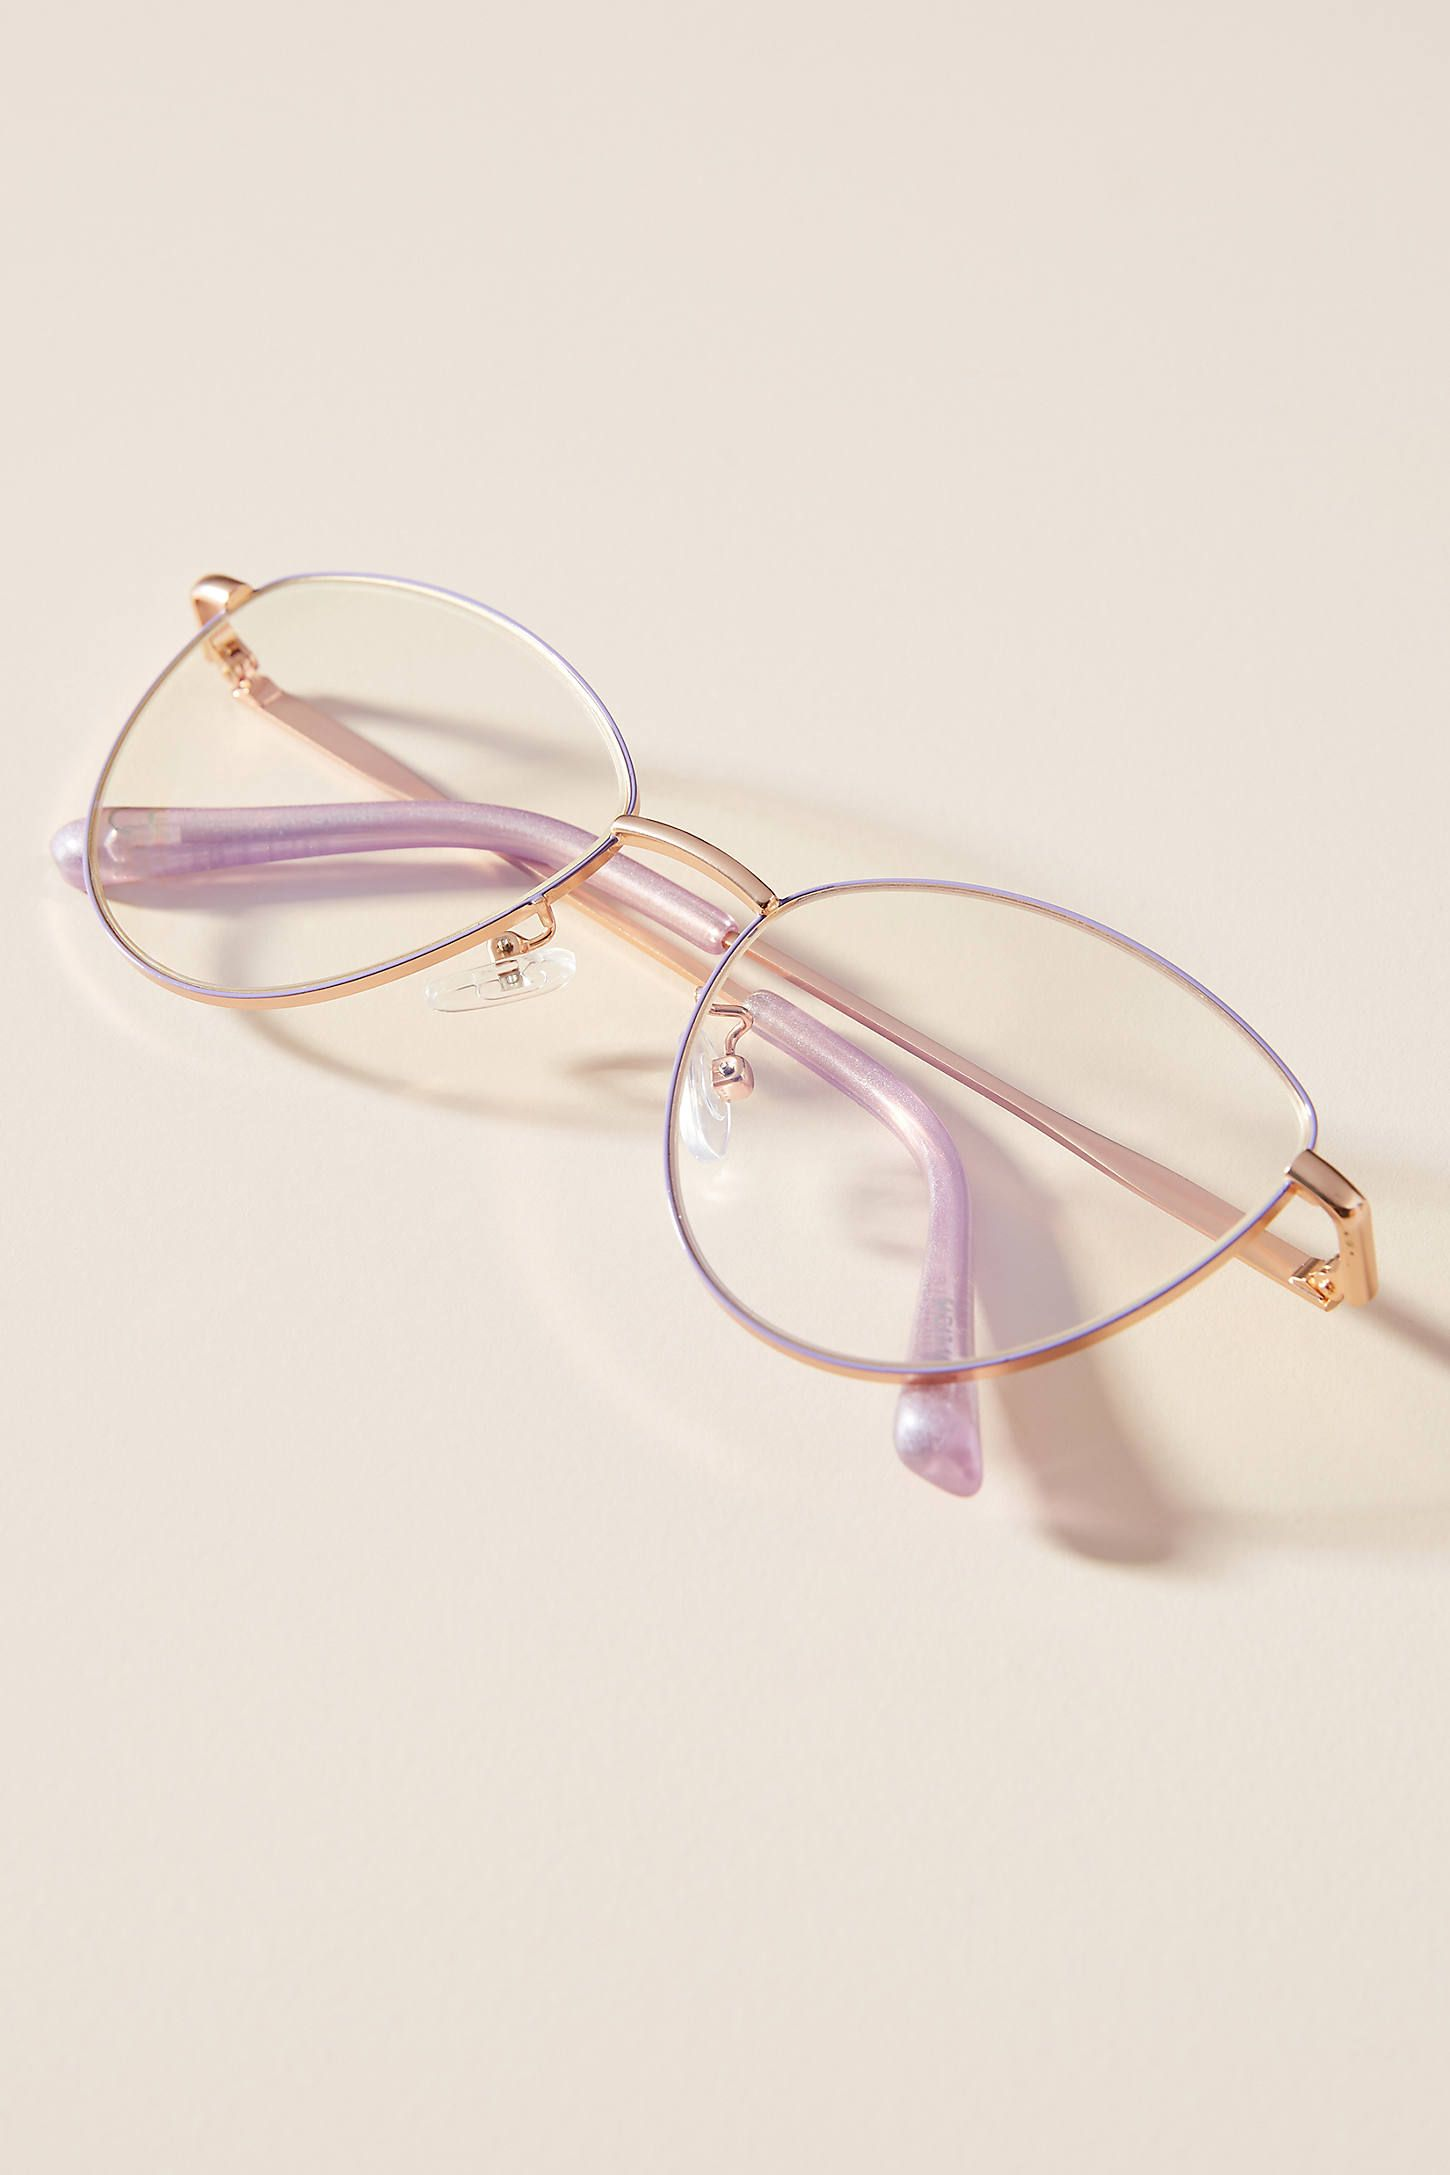 Photo of ZiGi + MARAiS Astrid Blue Light Glasses by Anthropologie in Purple Size: All, Eyewear